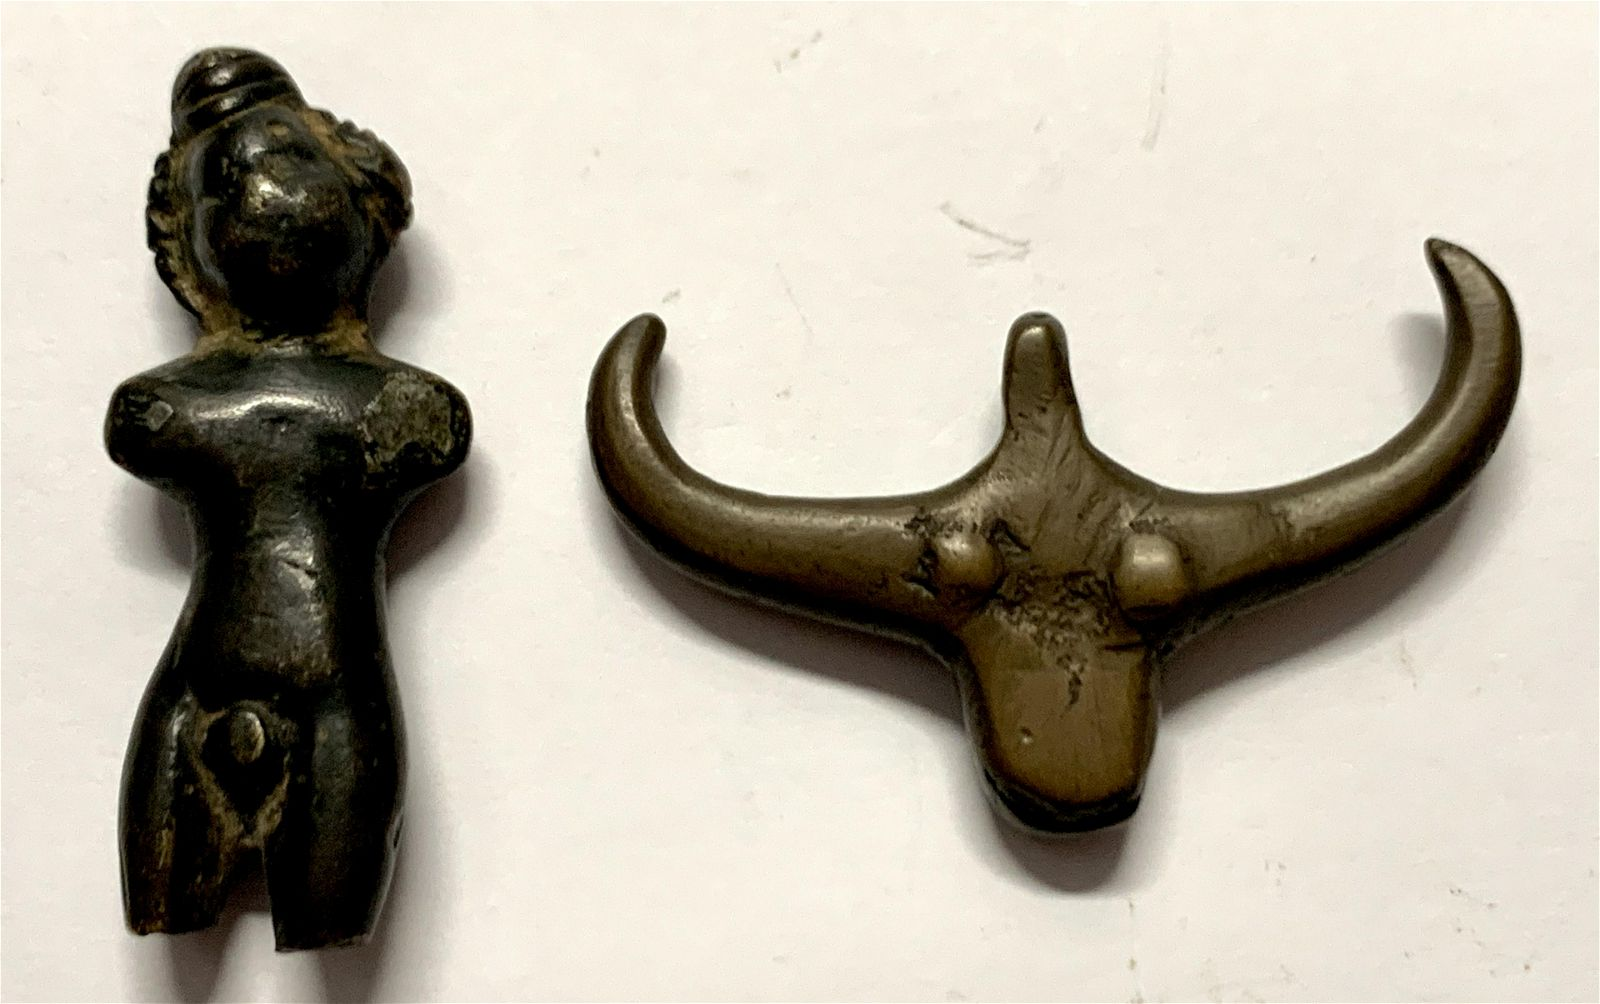 Lot of 2 Ancient Roman Bronze figure, Bull c.1st-2nd